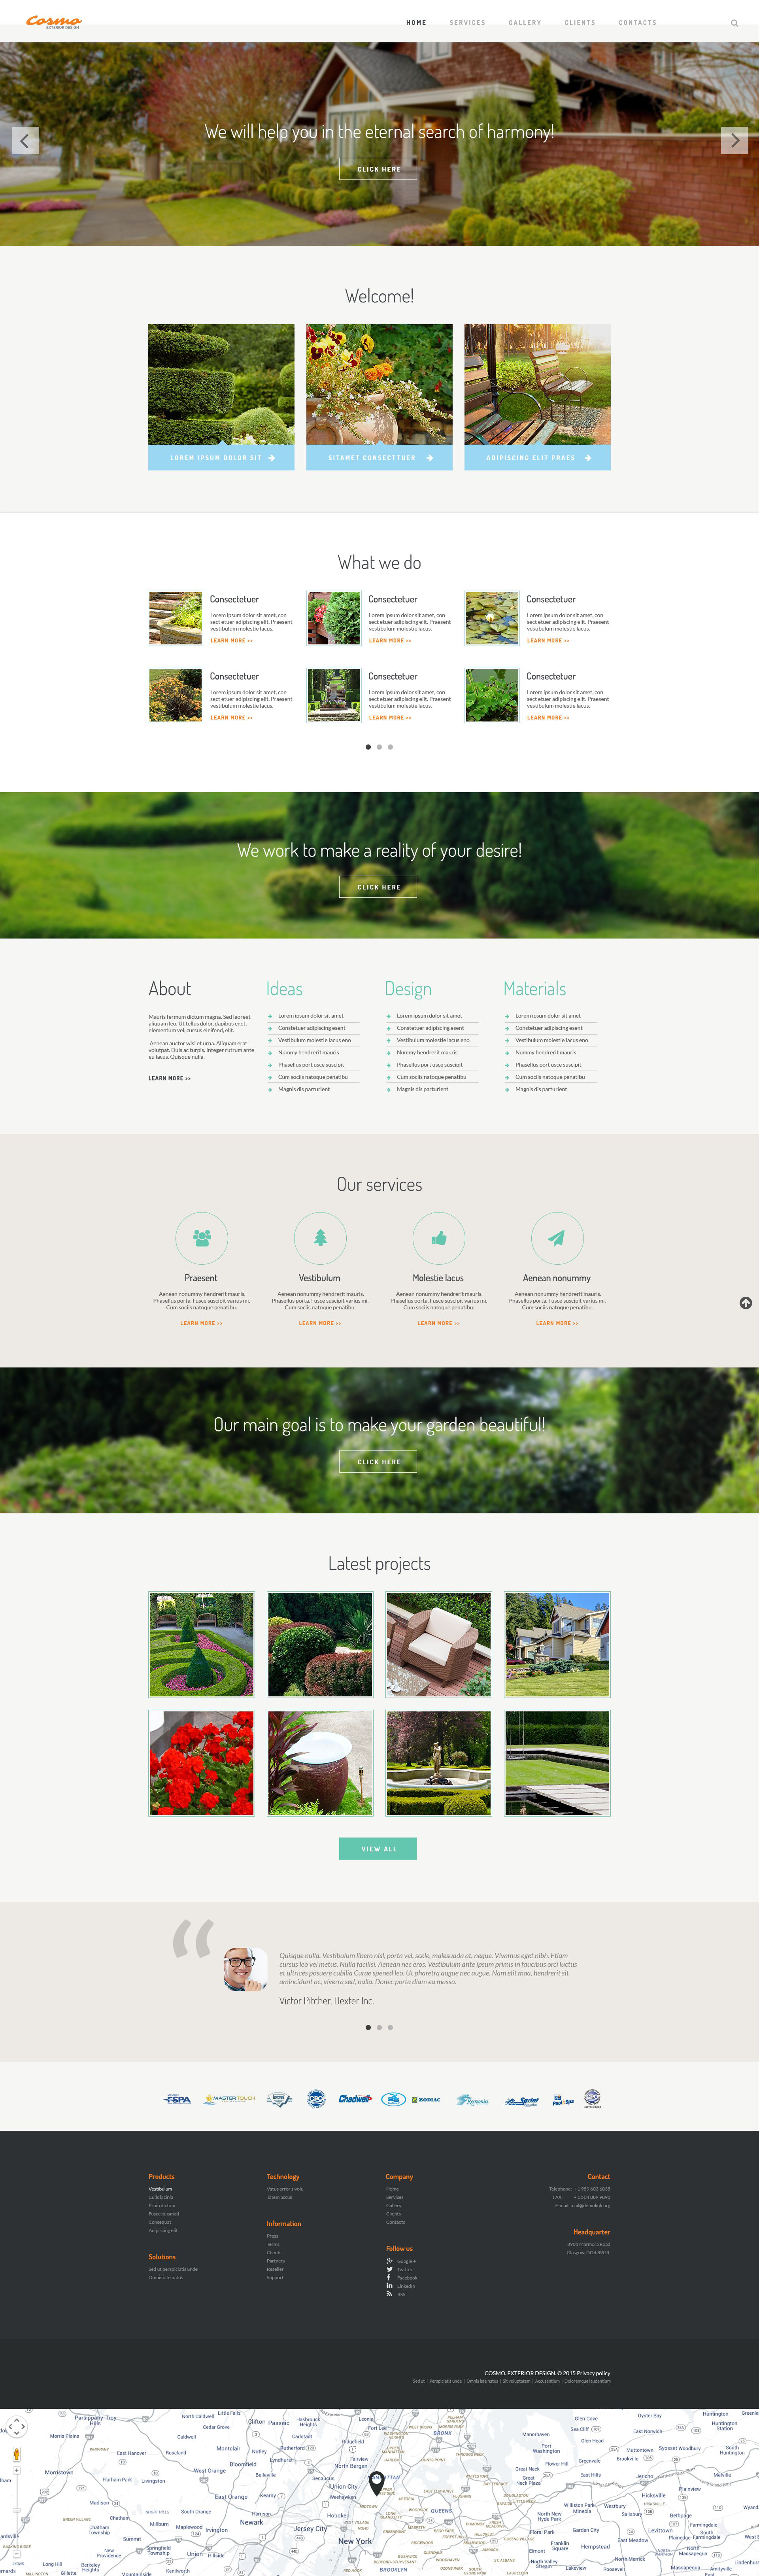 Exterior design responsive website template 54566 for Exterior design templates